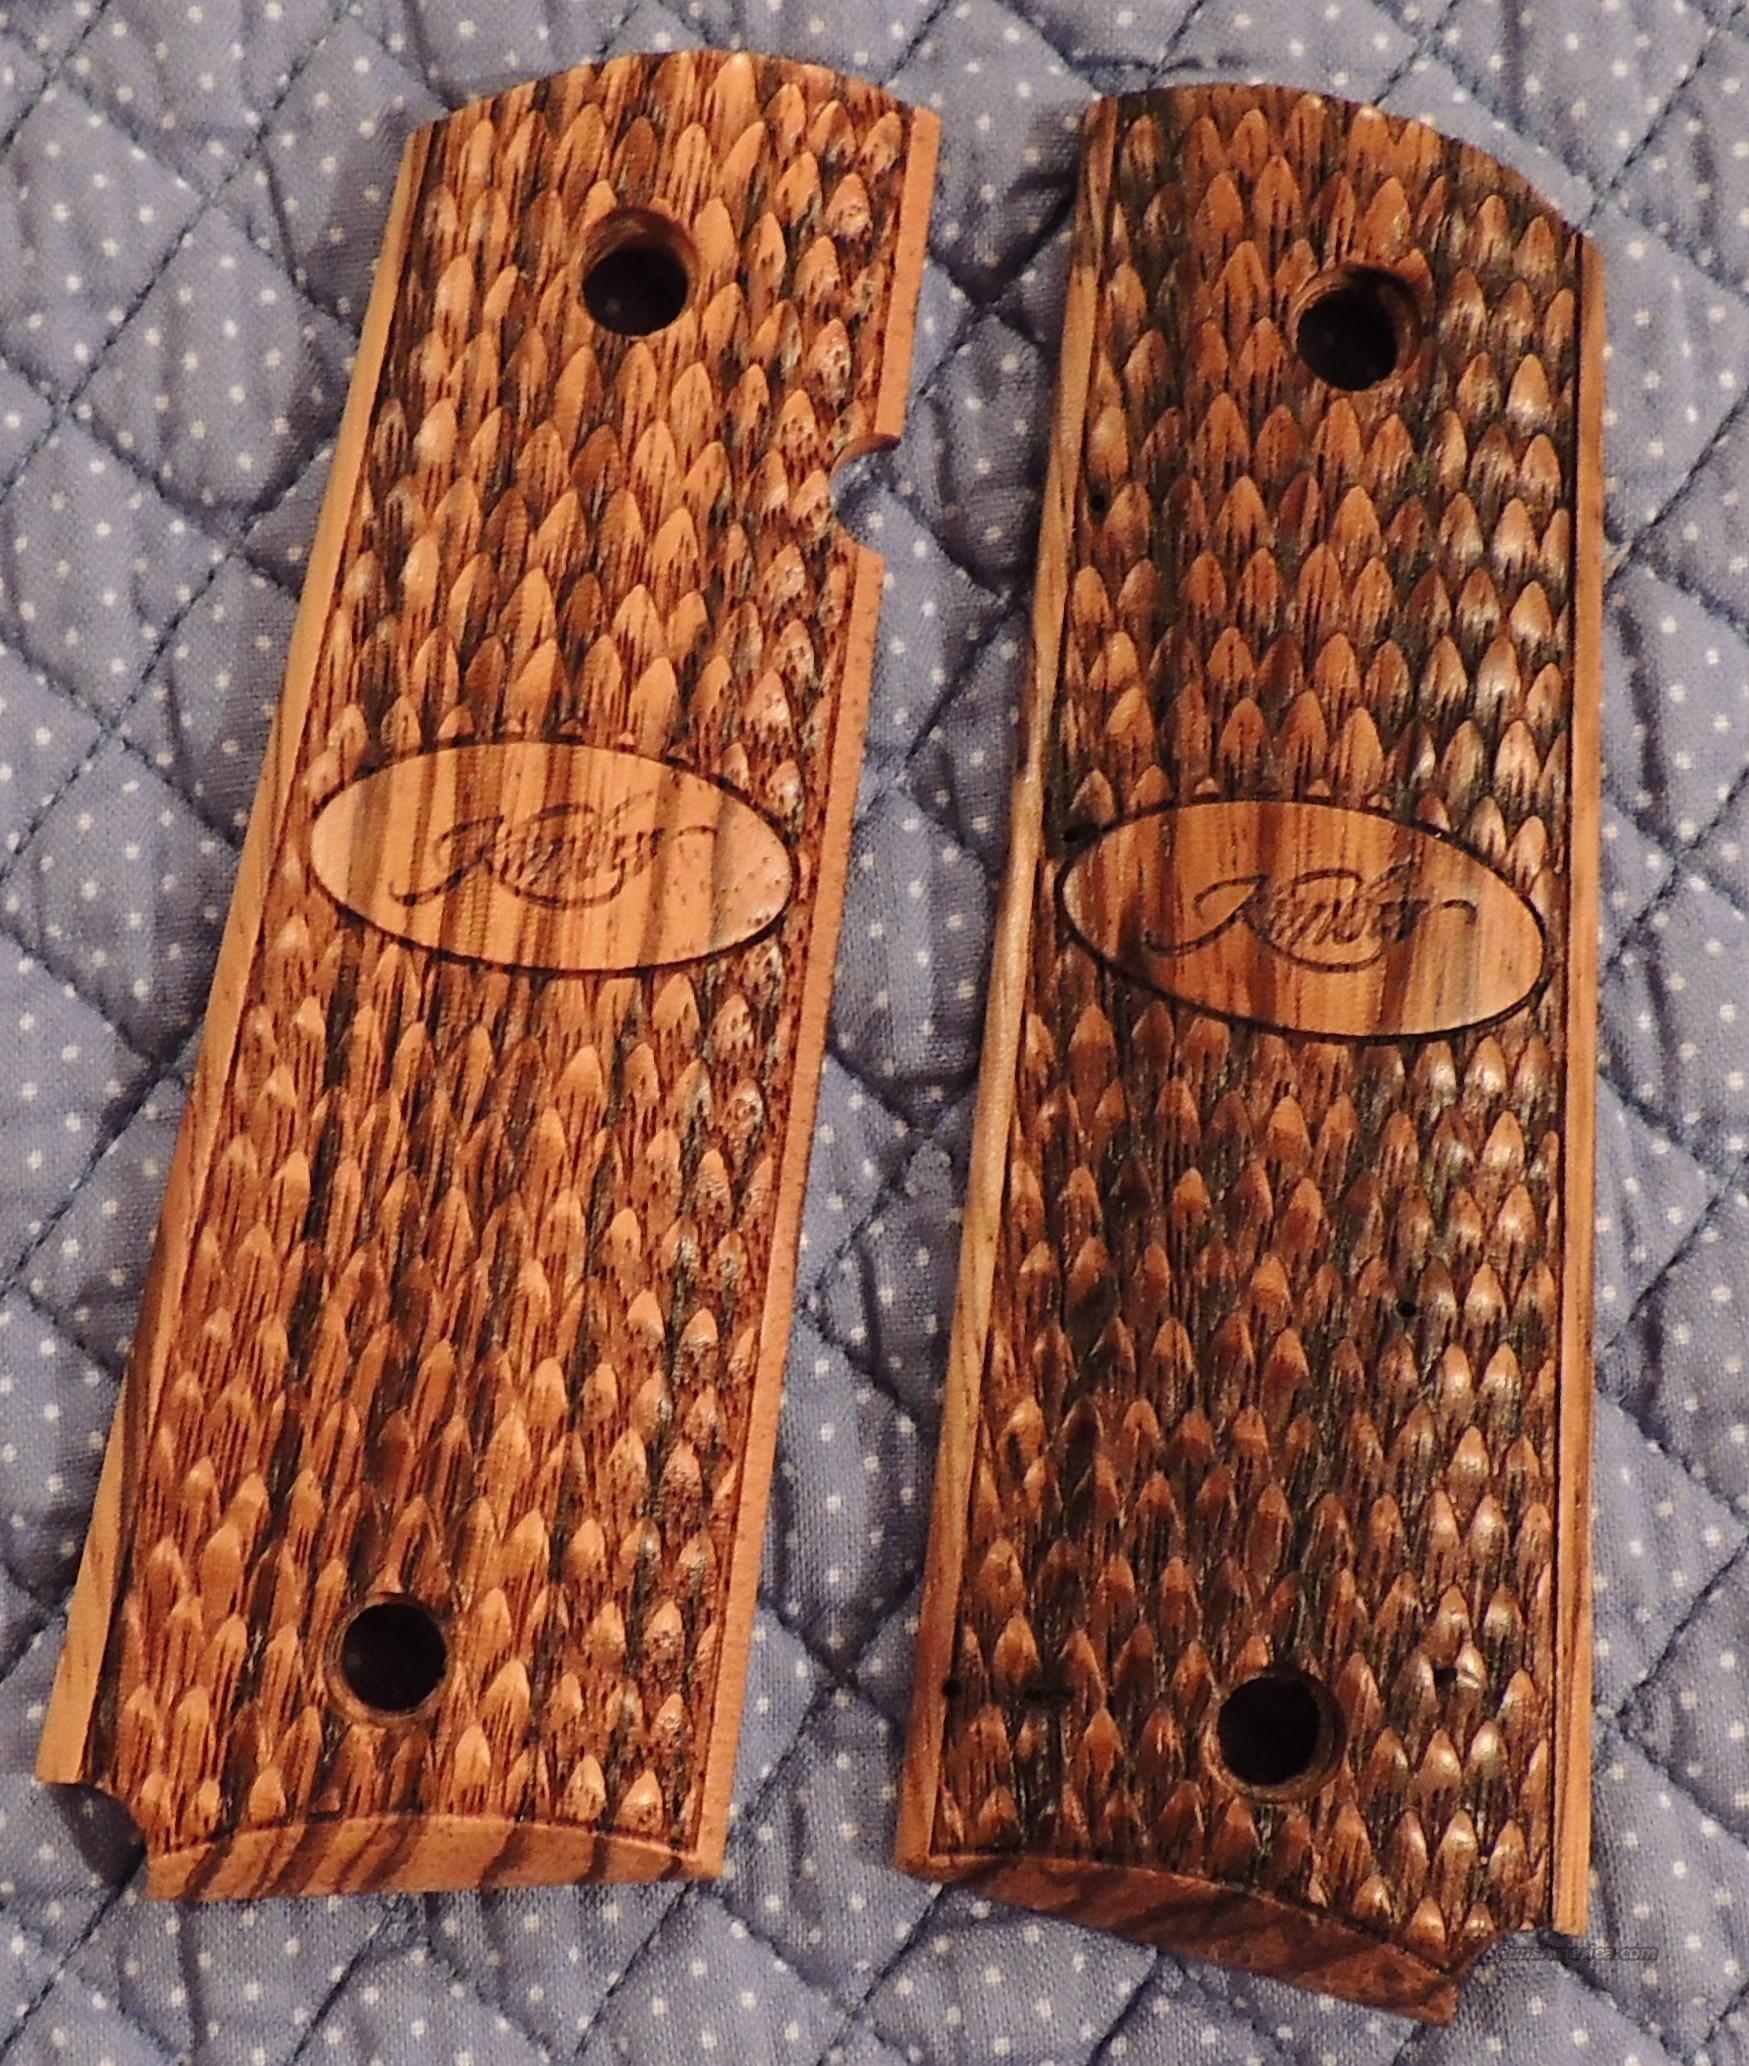 Kimber Full Size 1911 Wood Raptor Grips For Sale